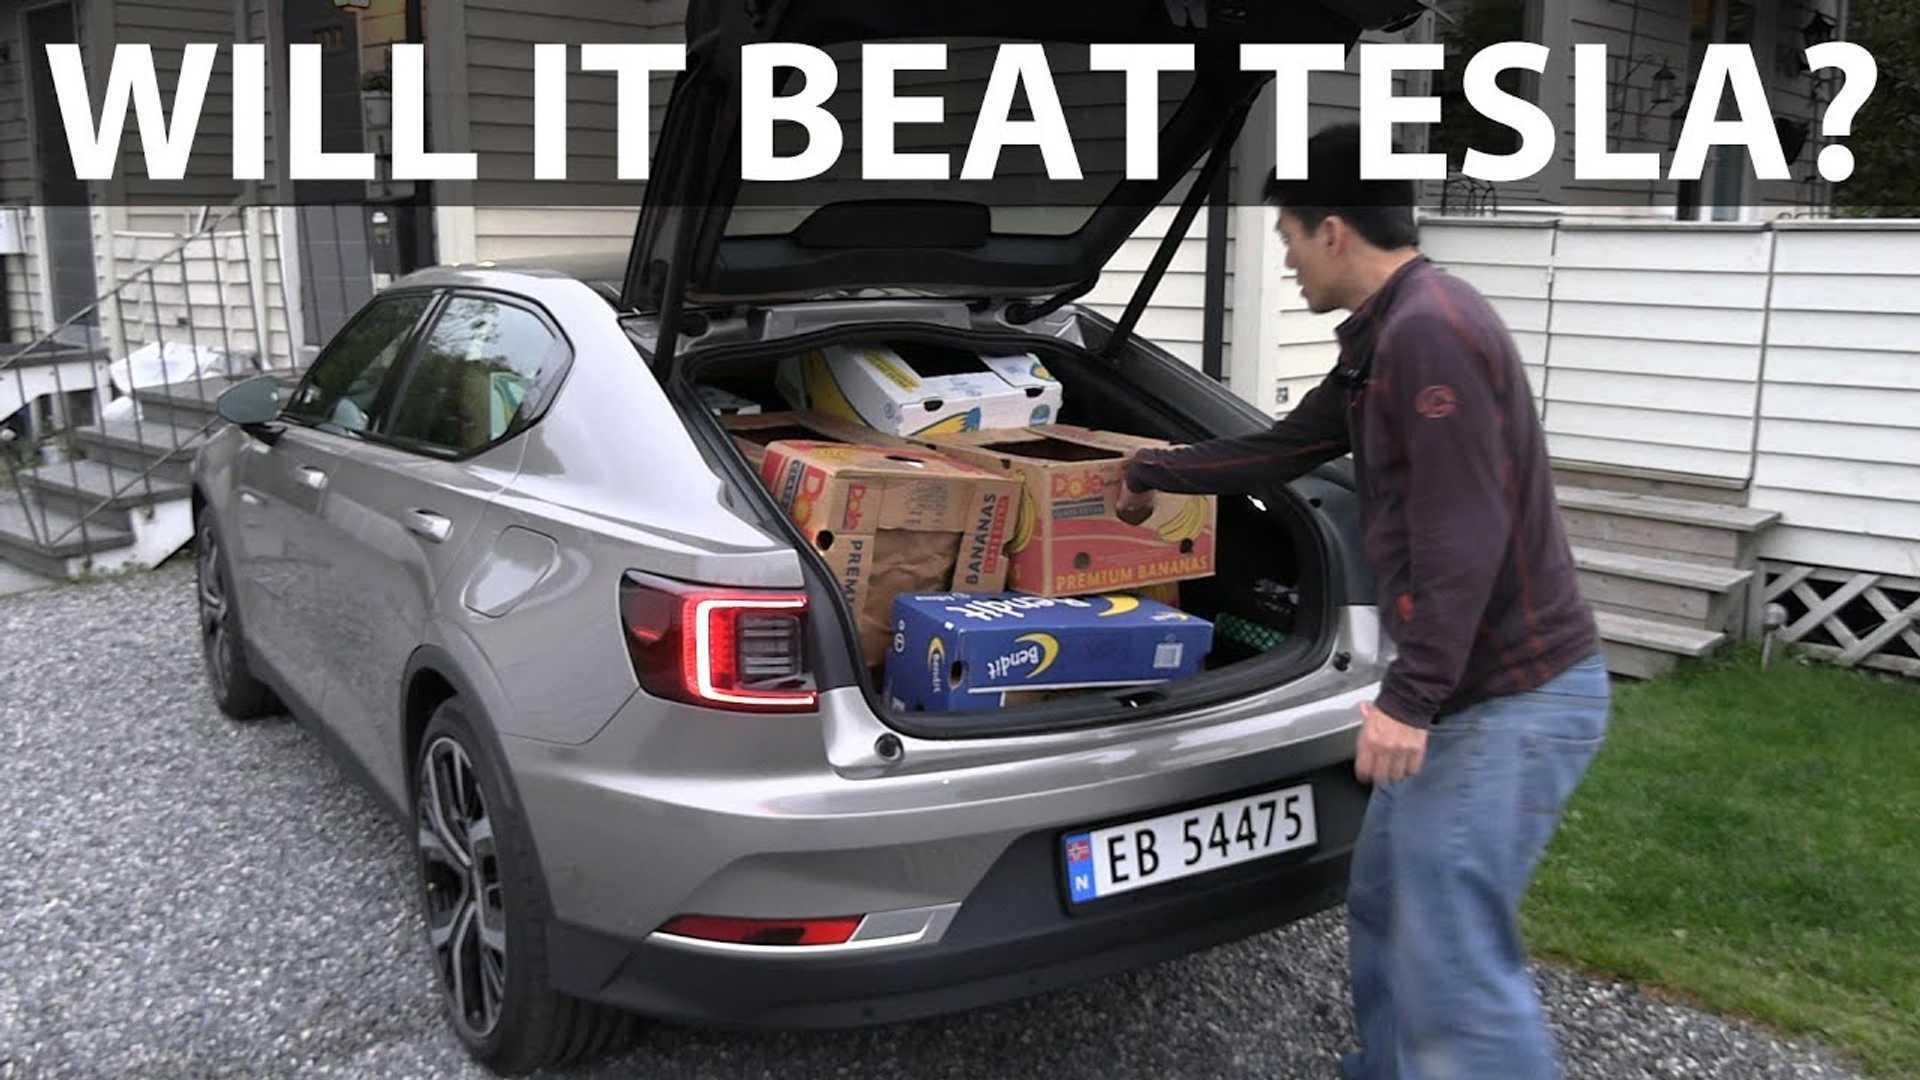 Polestar 2 Beats Tesla Model 3 In Banana Box Test